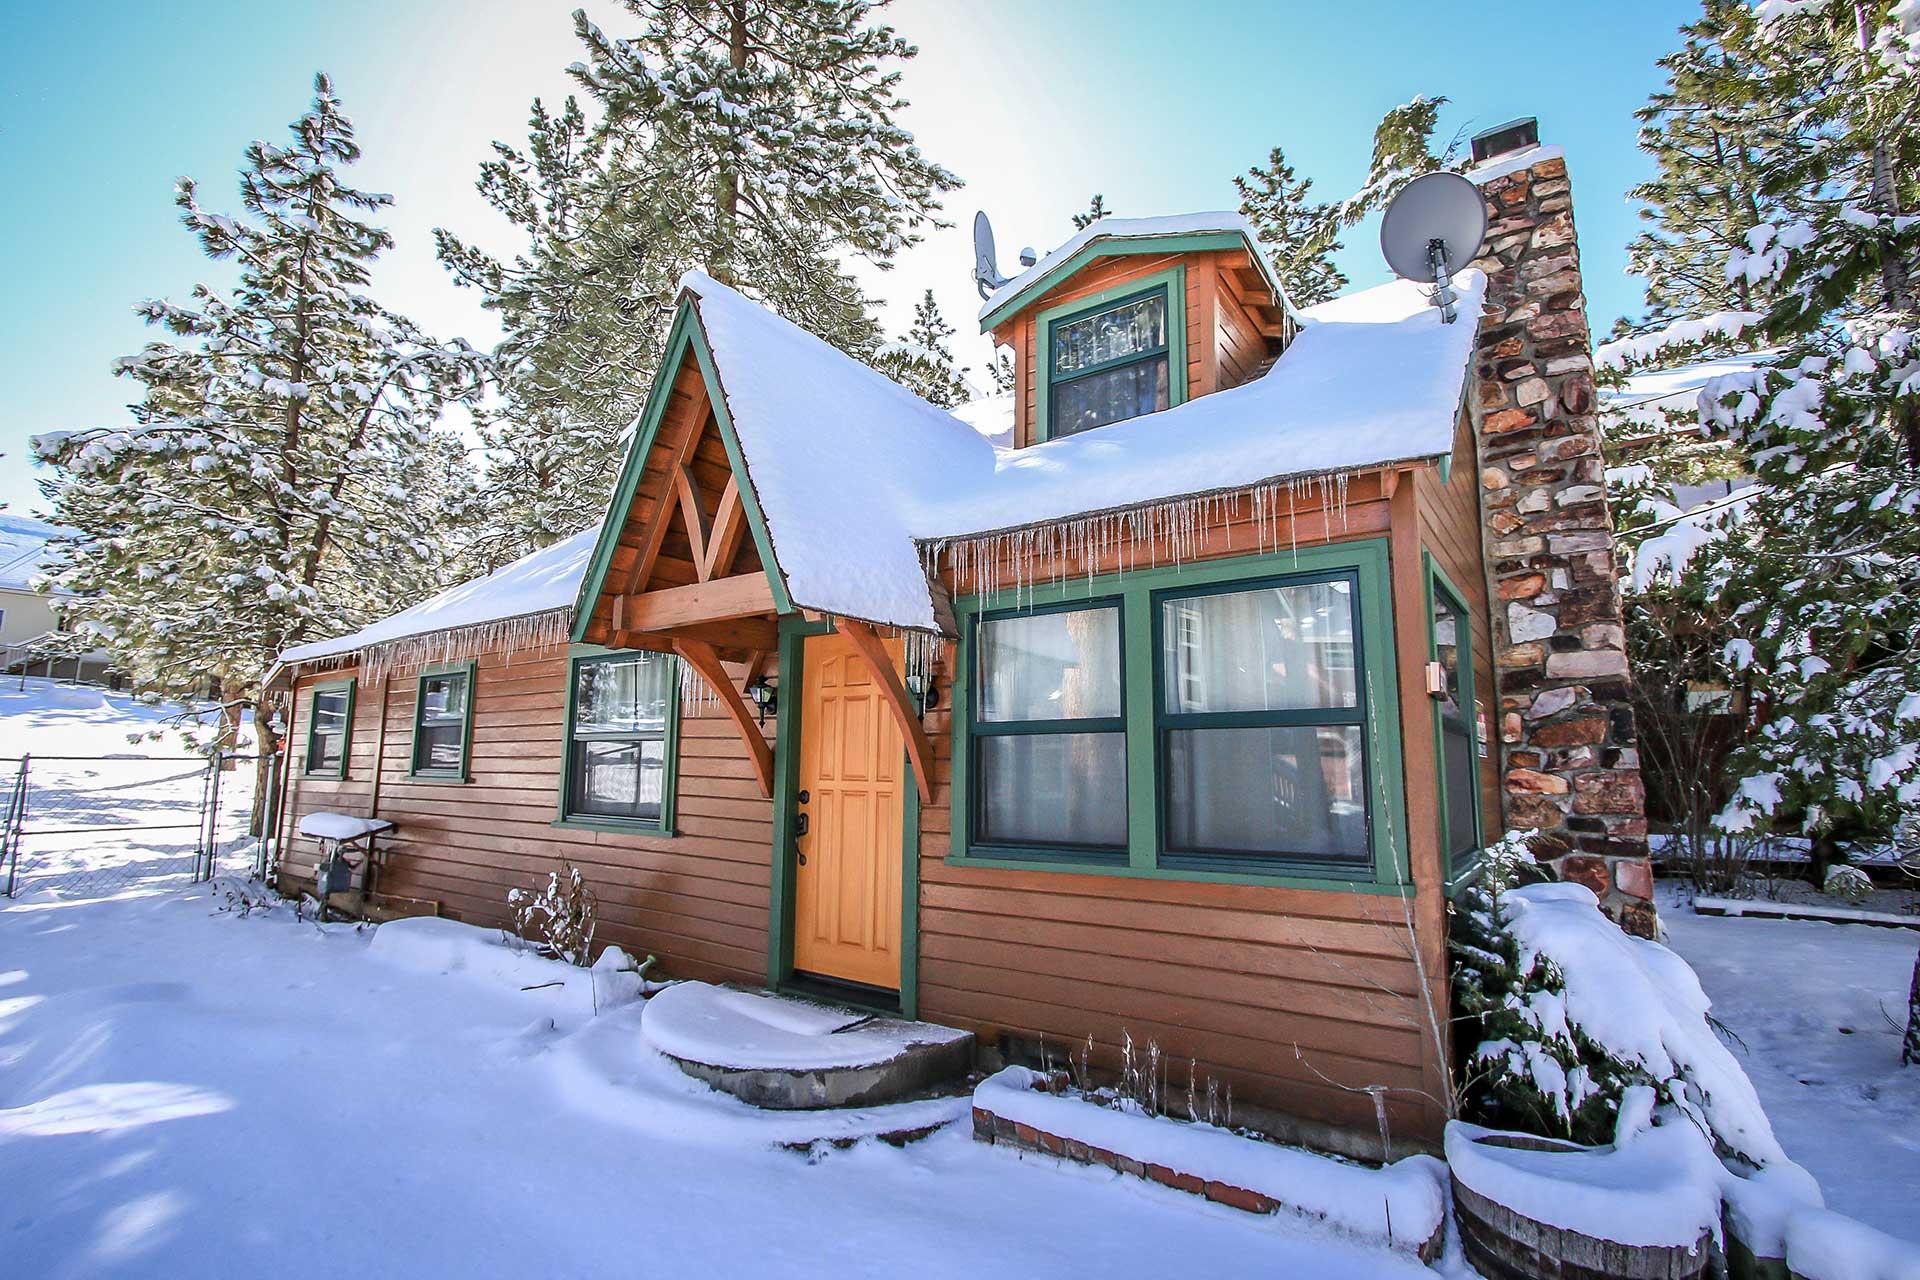 1463 elgin retreat ra46070 redawning for Big bear lakefront cabin rentals